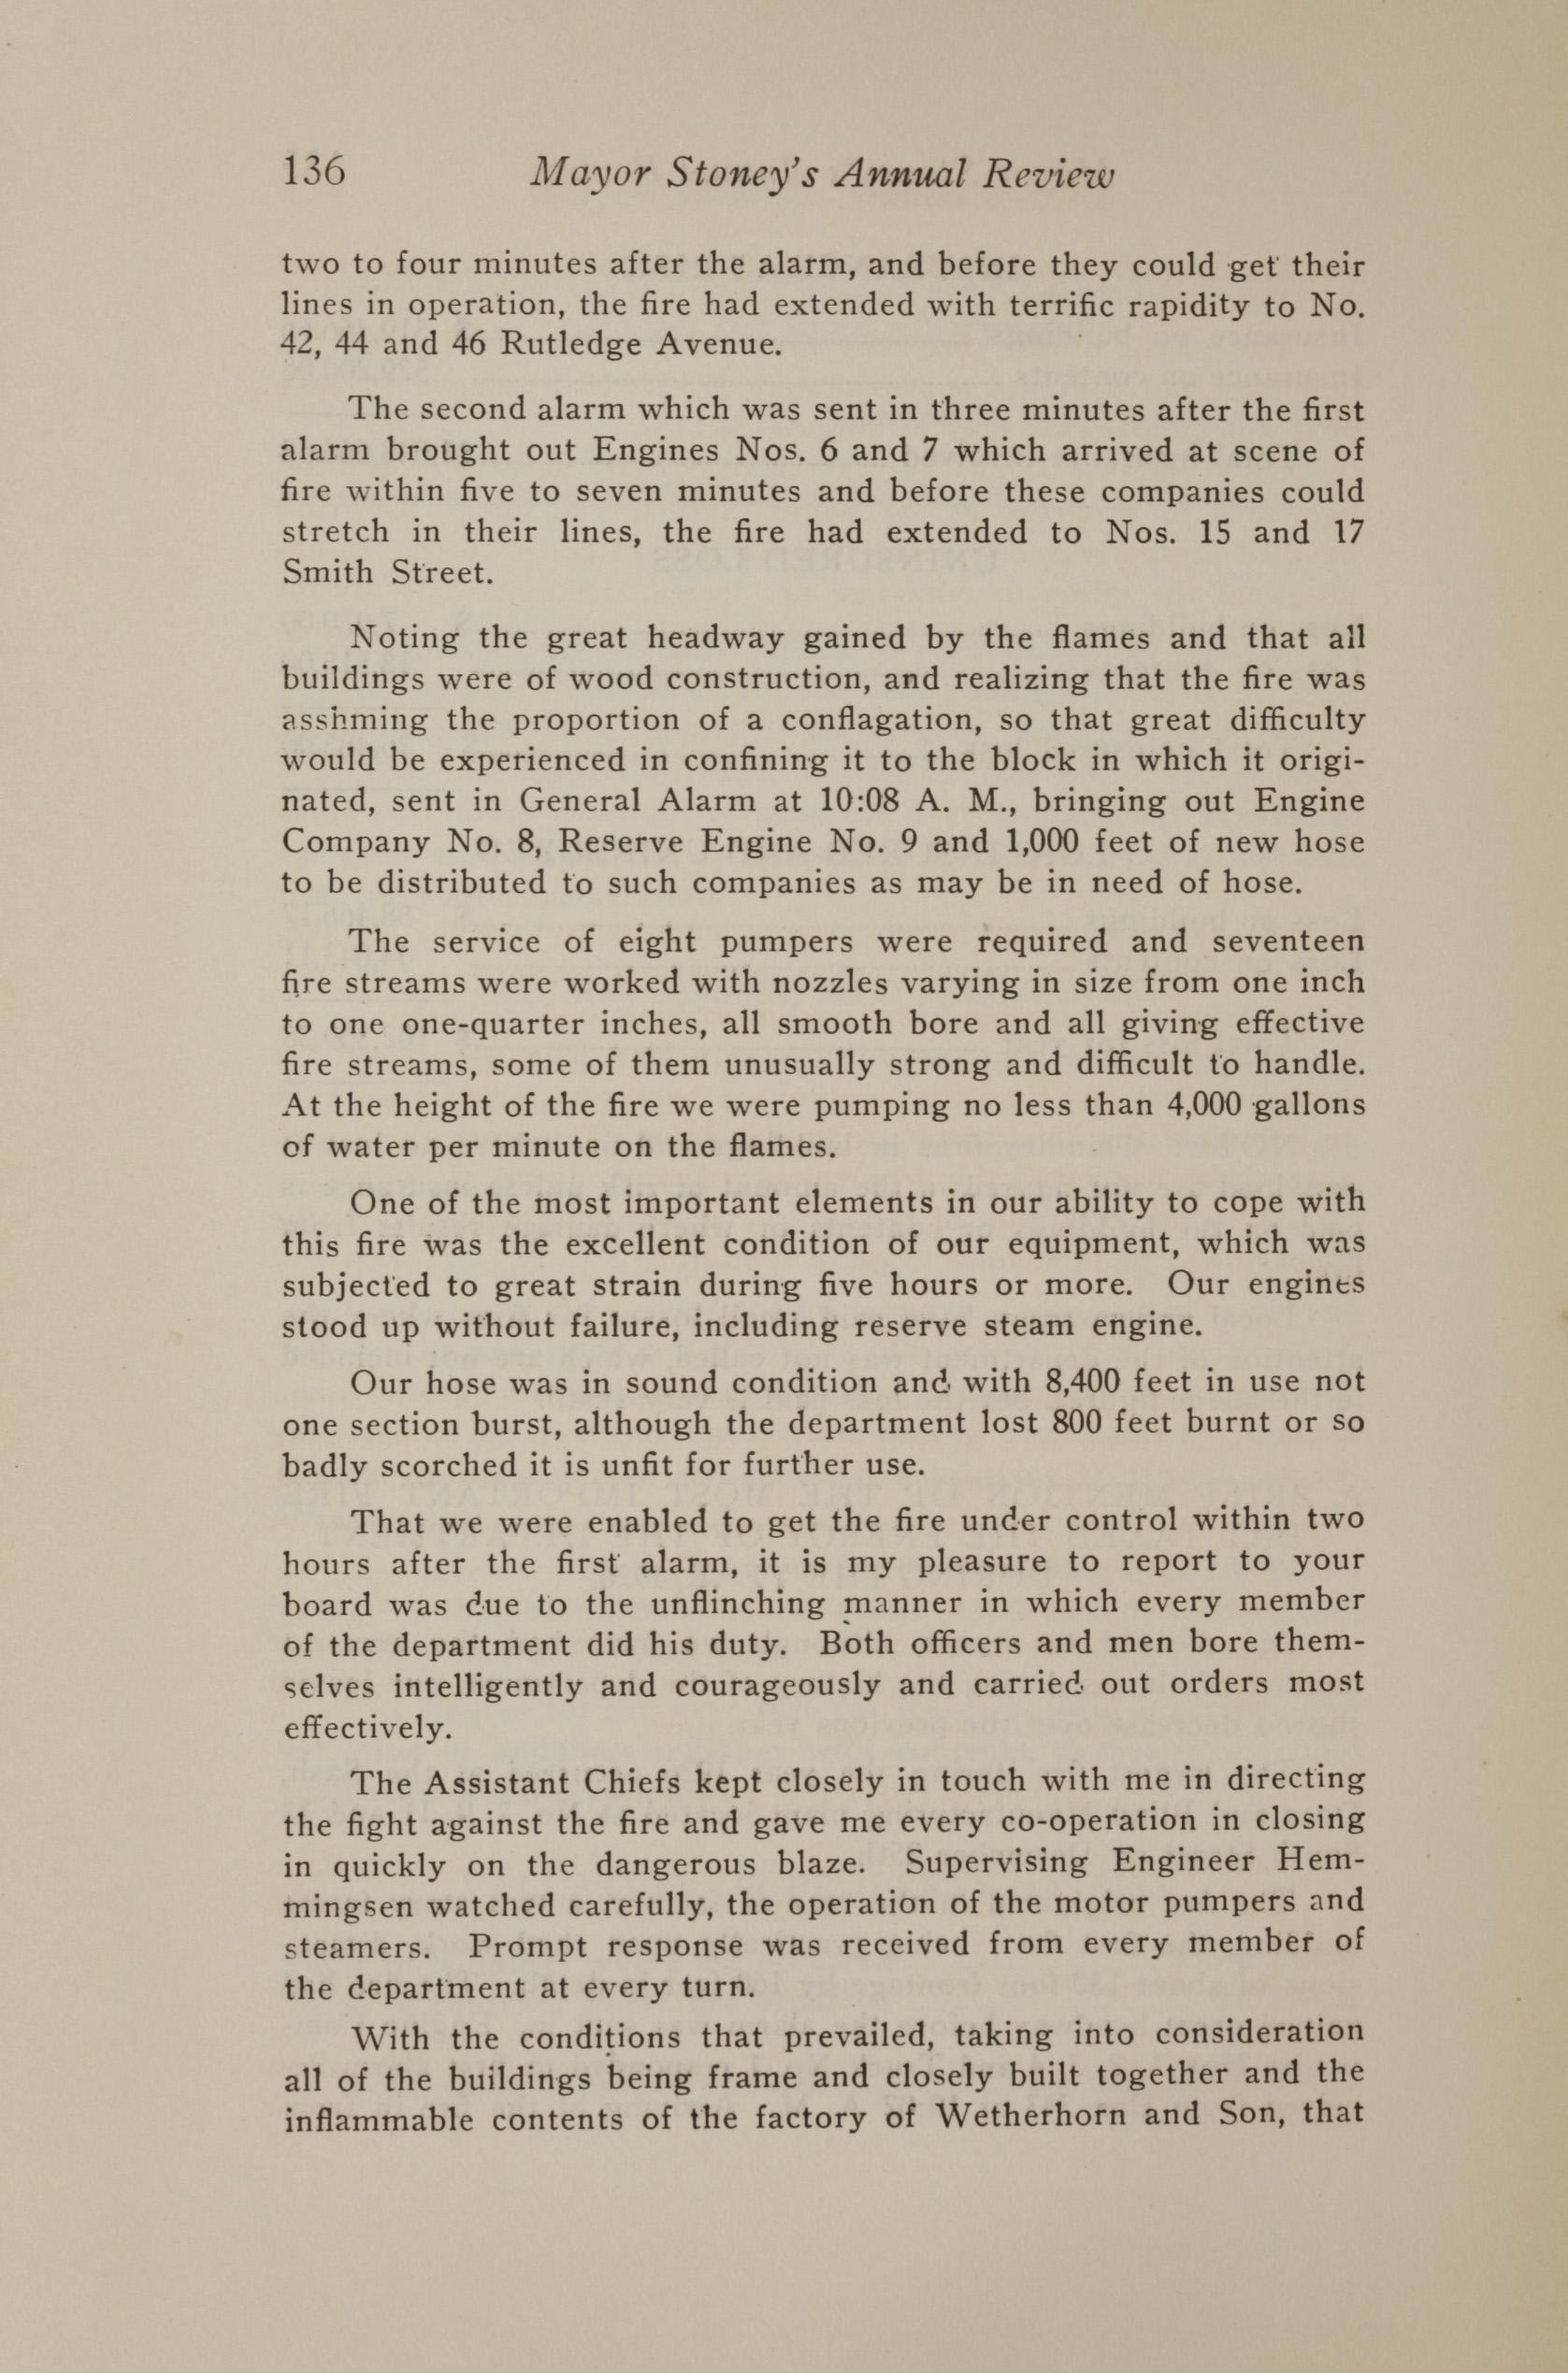 Charleston Yearbook, 1926, page 136